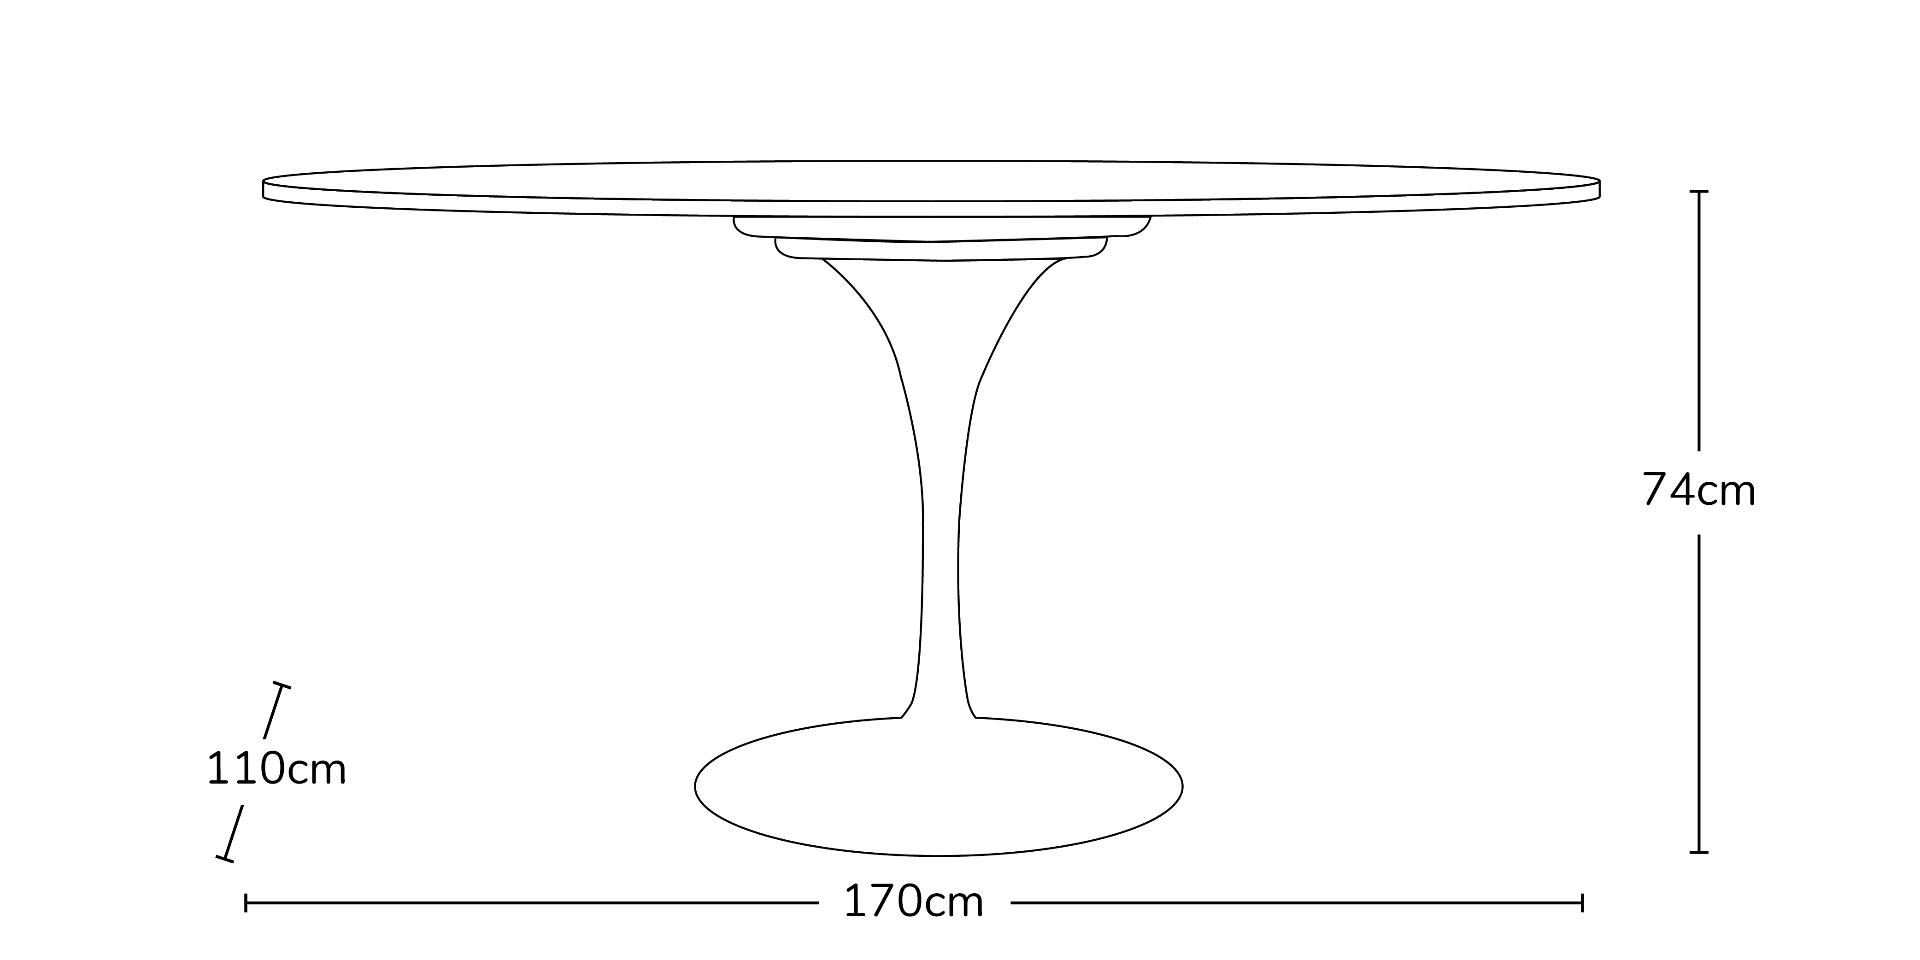 Eero Saarinen Inspired Tulip Table Top Oval Table 170cm